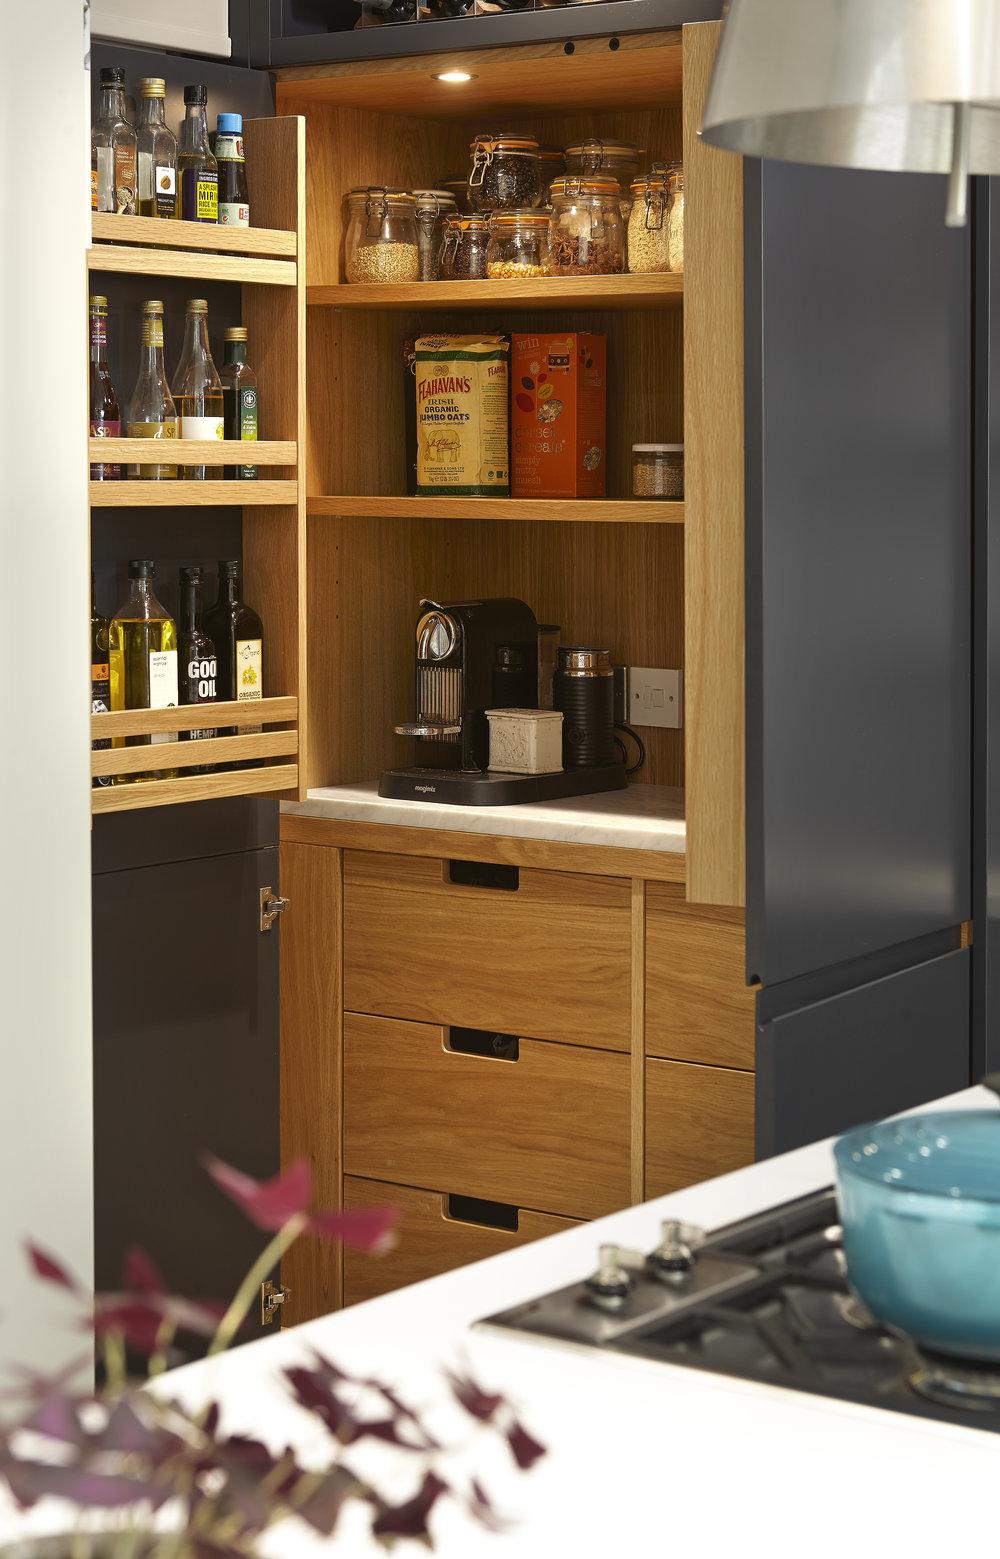 kitchens1148 1.jpg